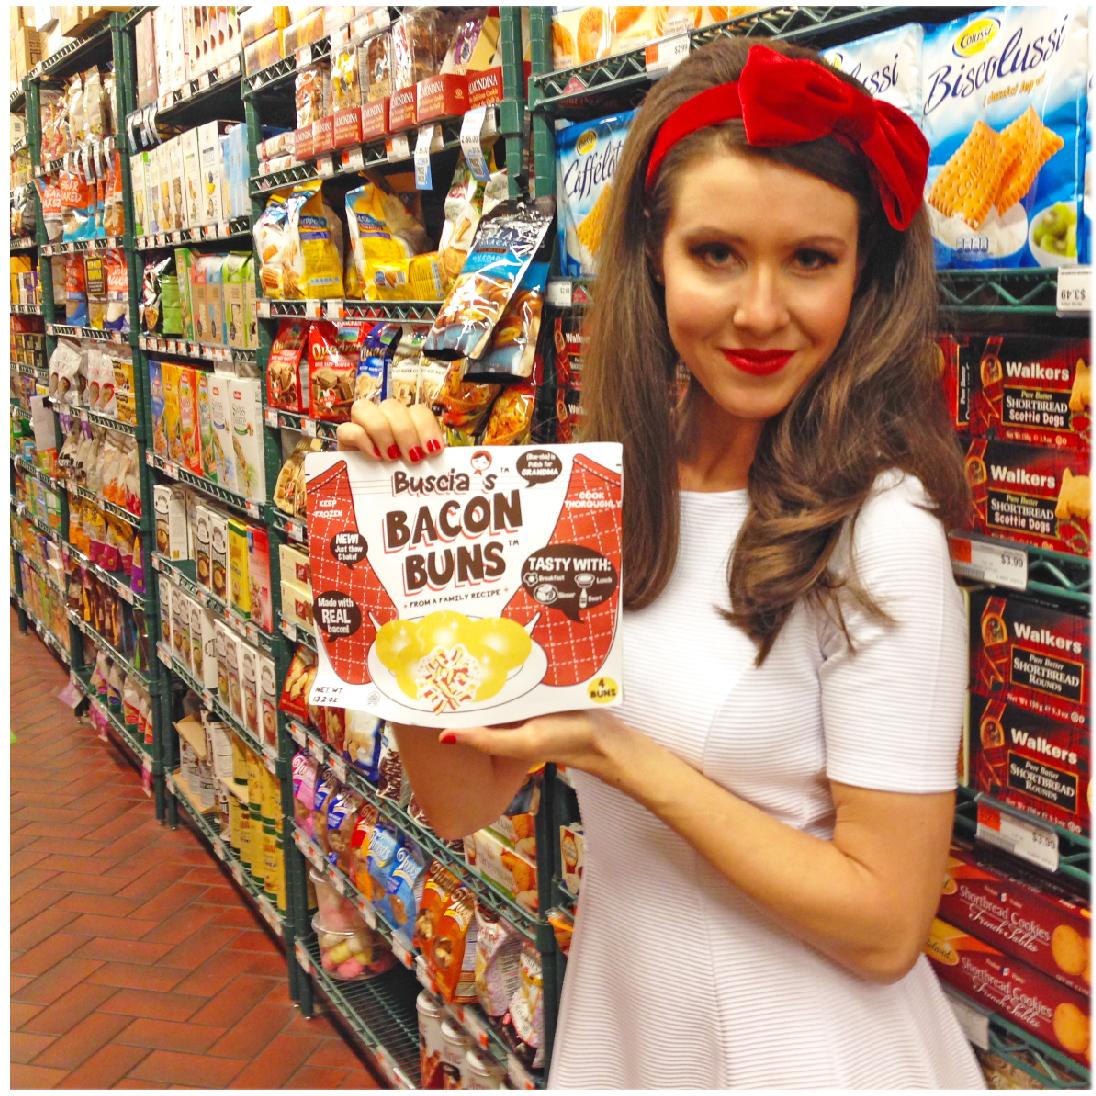 Sarah grocery store